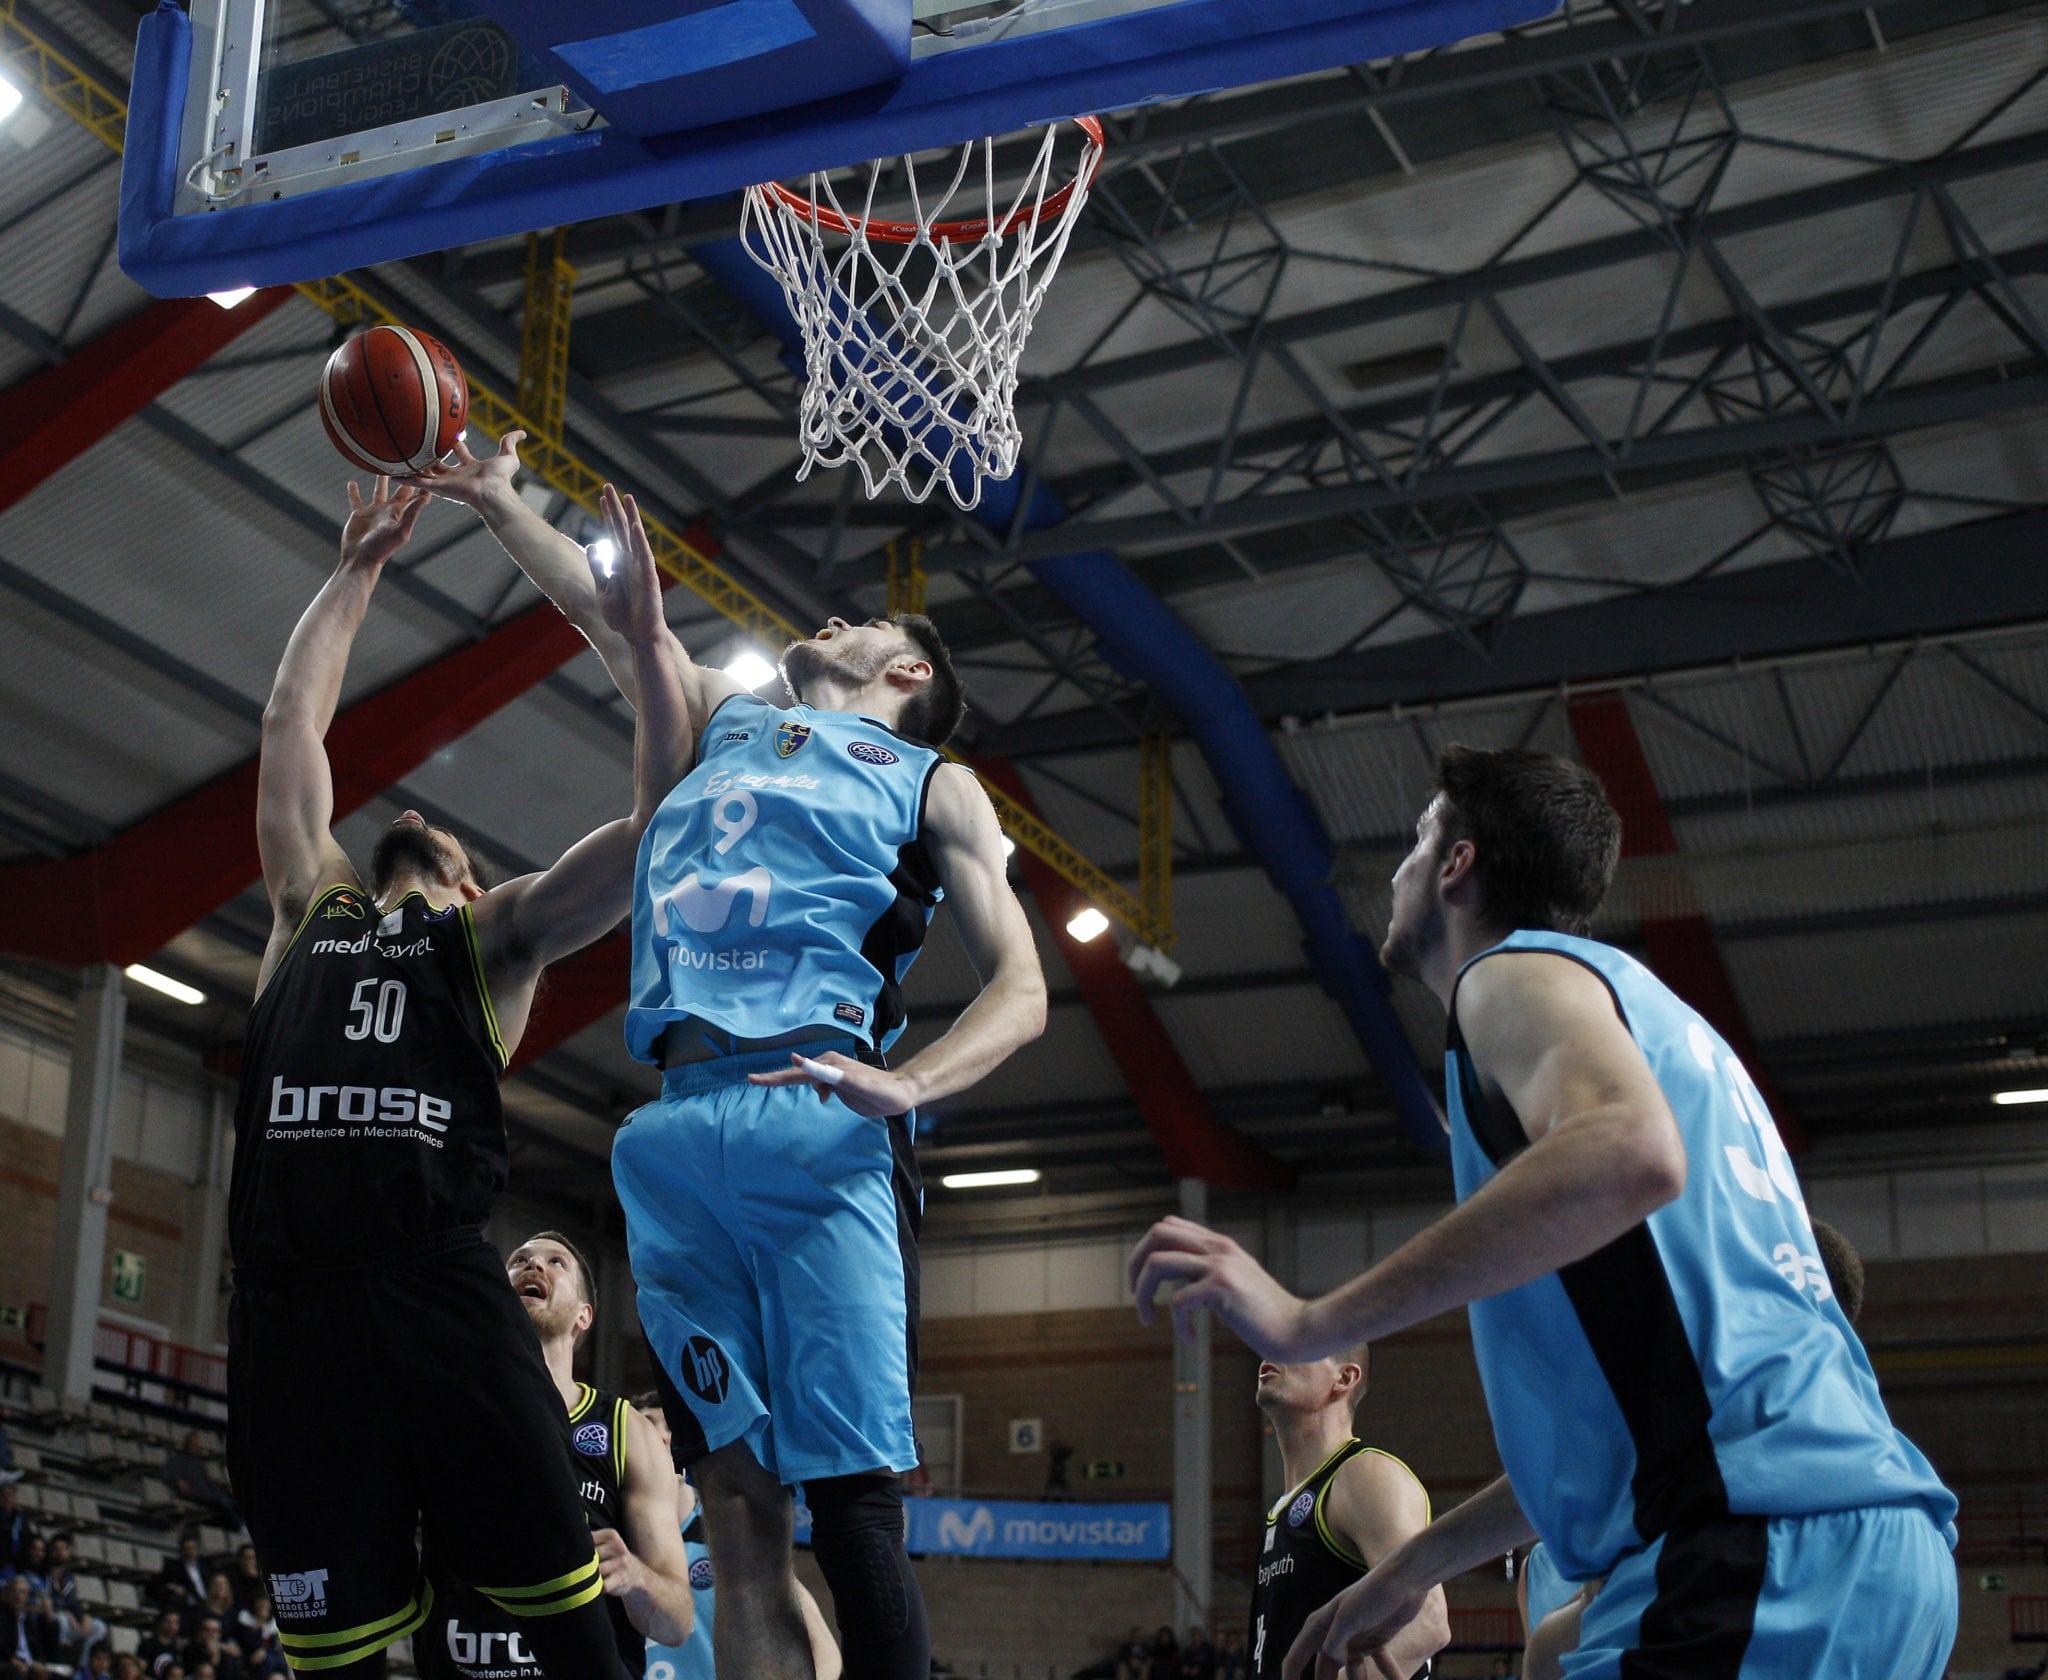 Fechas de las previas de Basketball Champions League